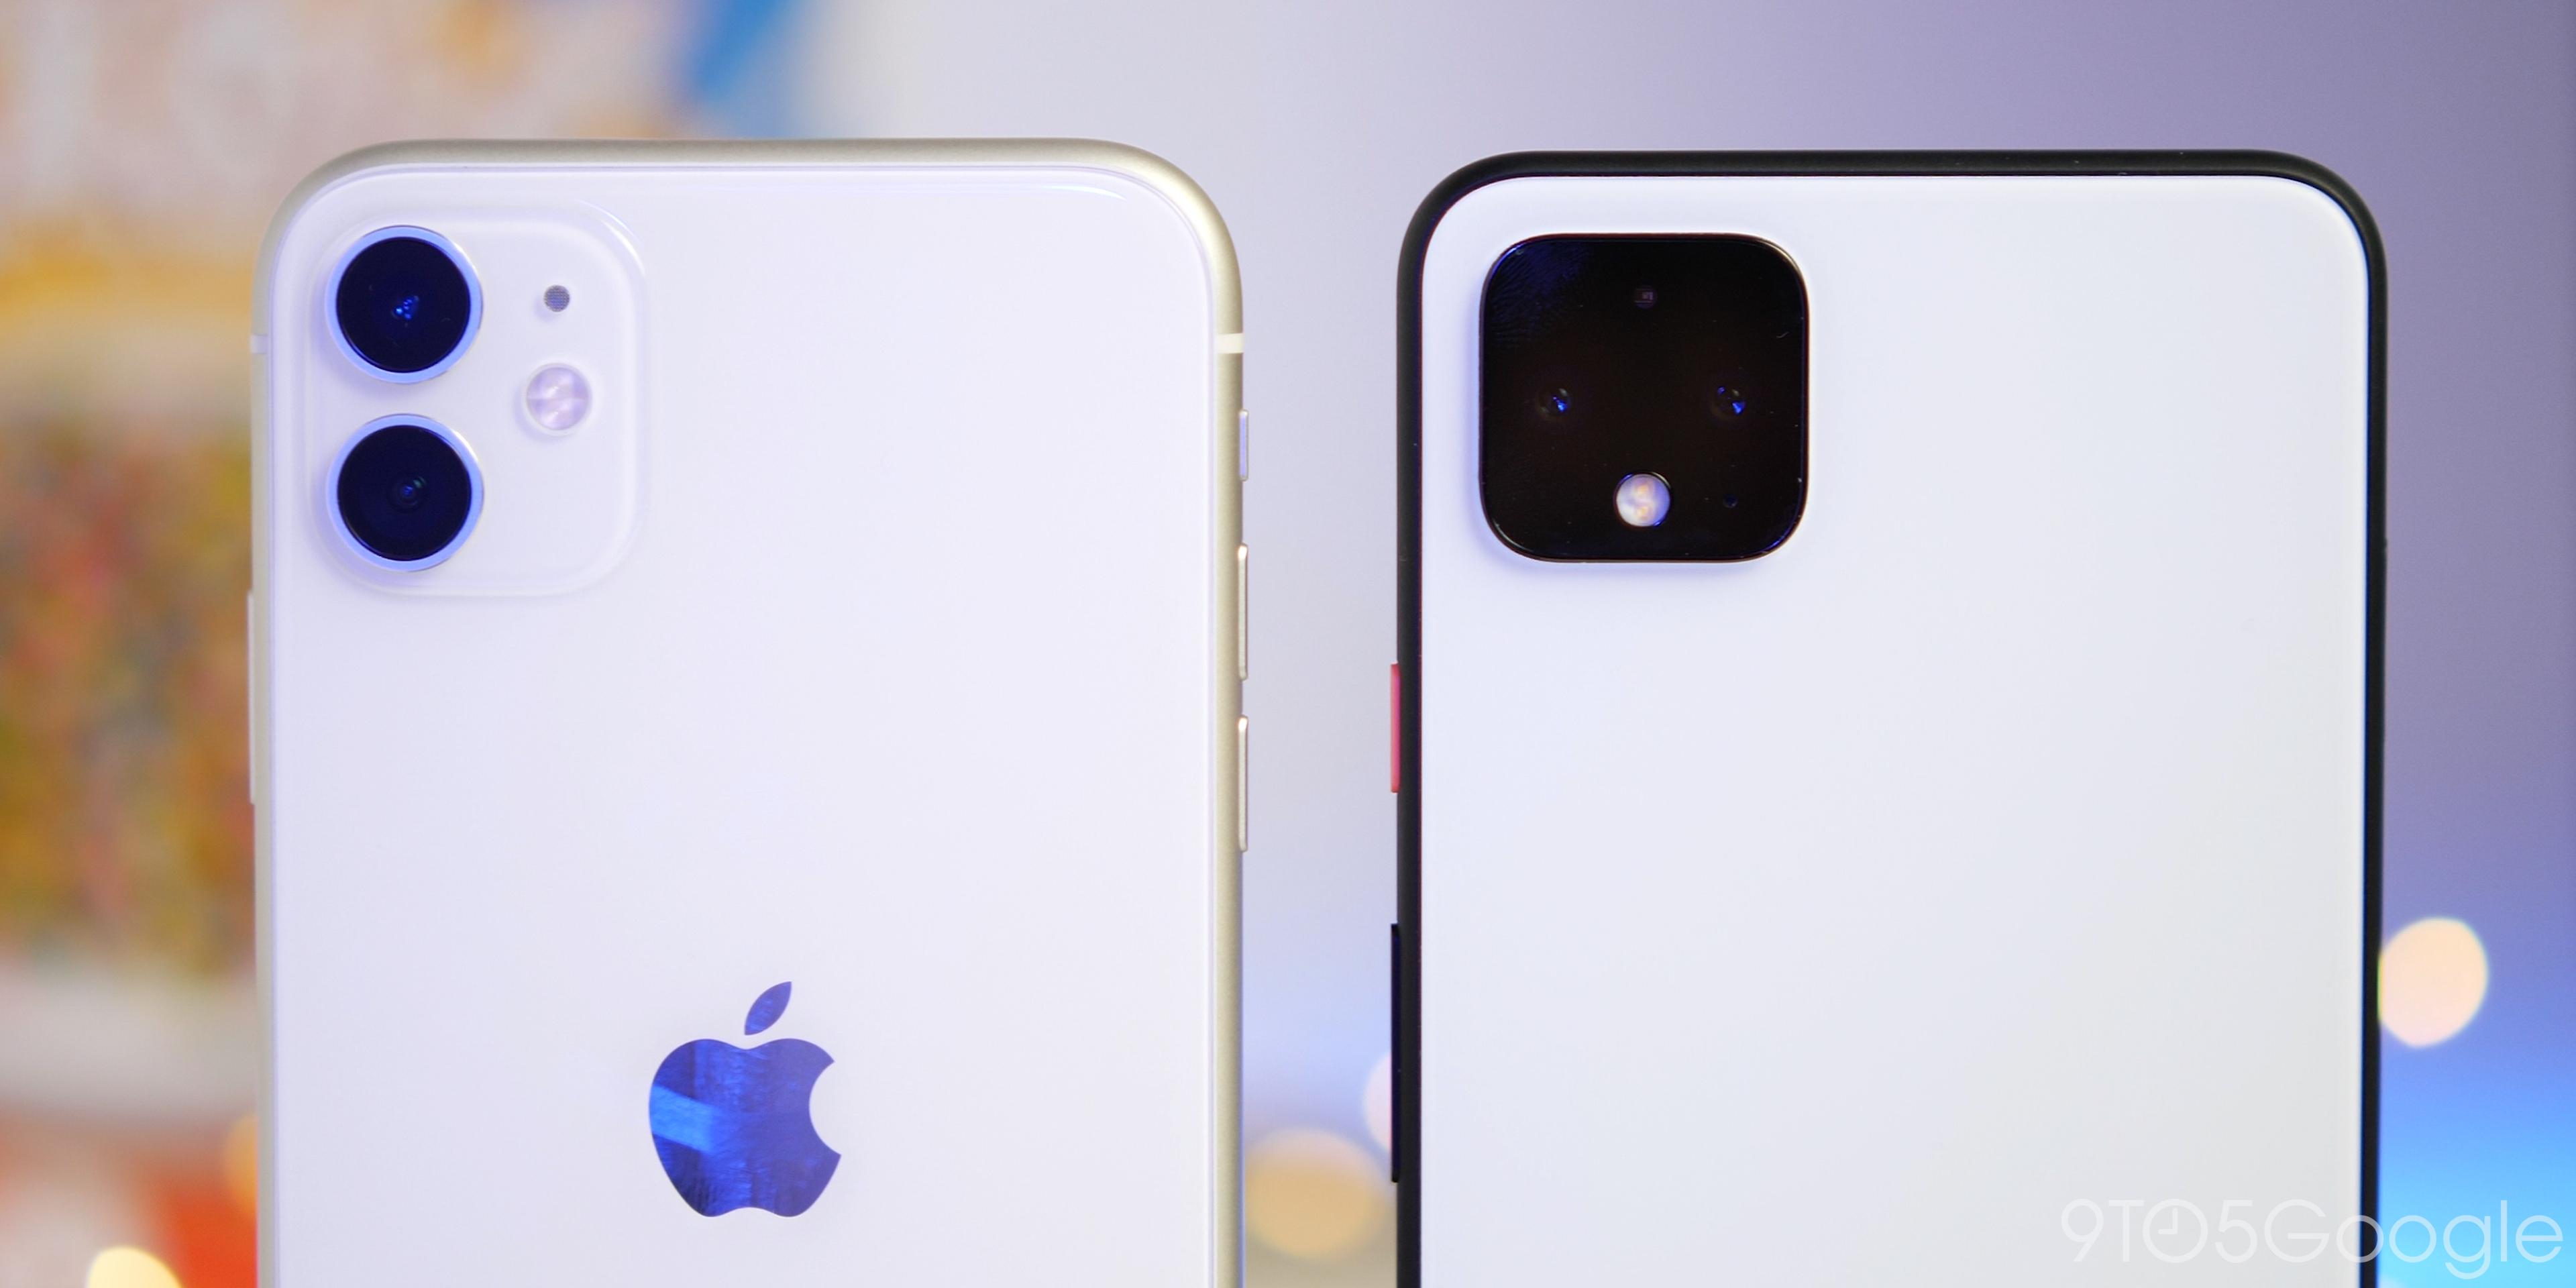 pixel 4 iphone 11